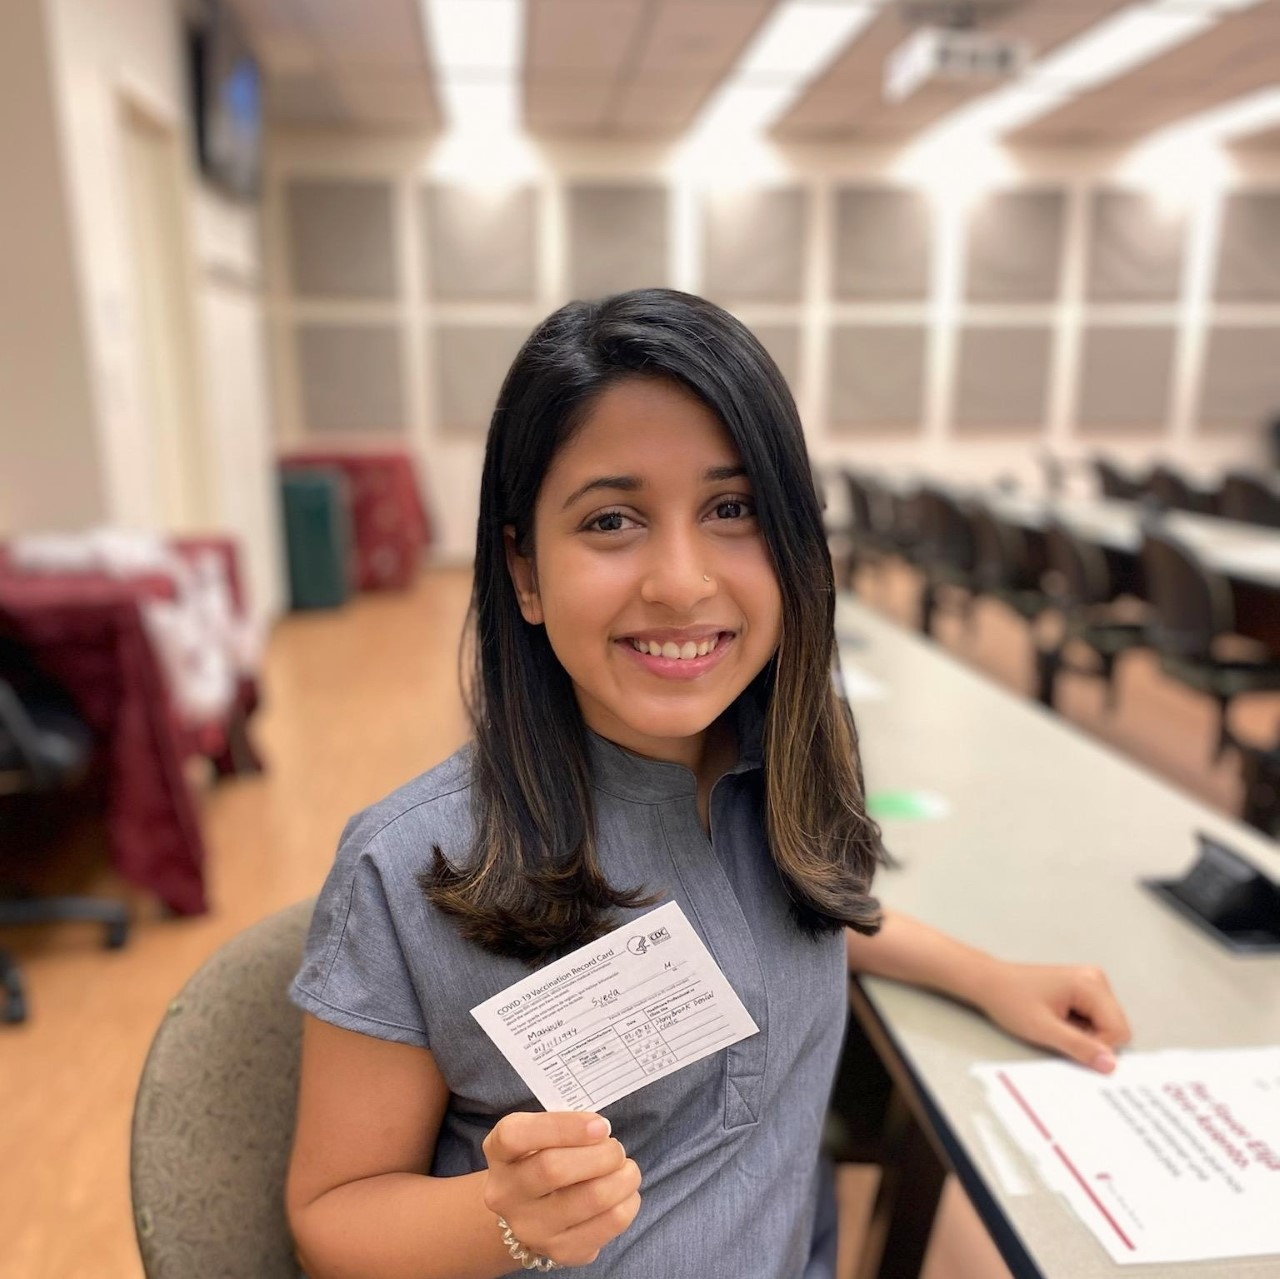 Stony Brook School of Dental Medicine student displays proof of vaccine card.